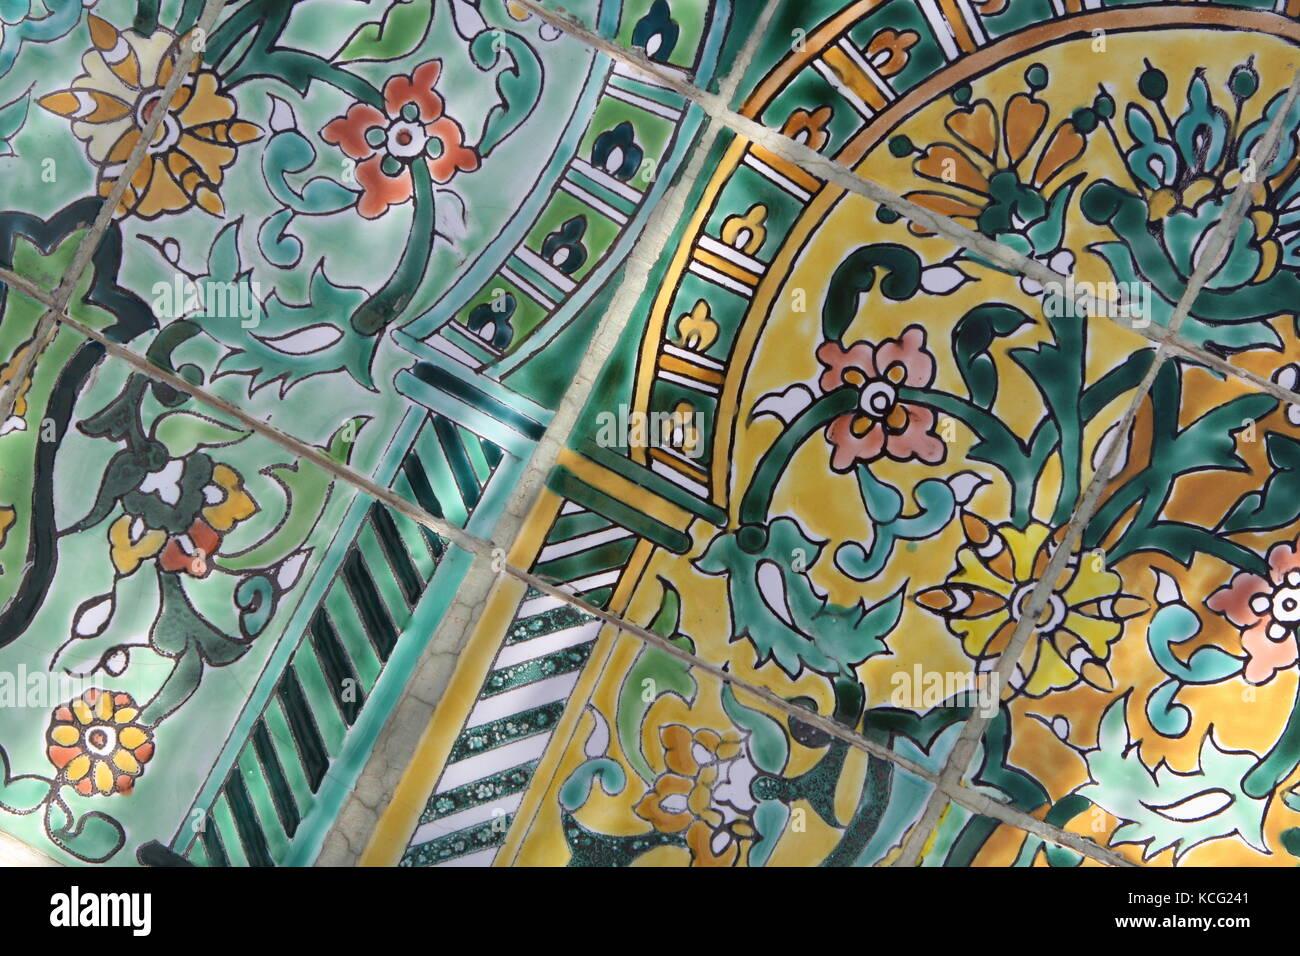 Kacheln Mosaik bunt in Marokko - Mosaic colorful tiles in Morocco - Stock Image